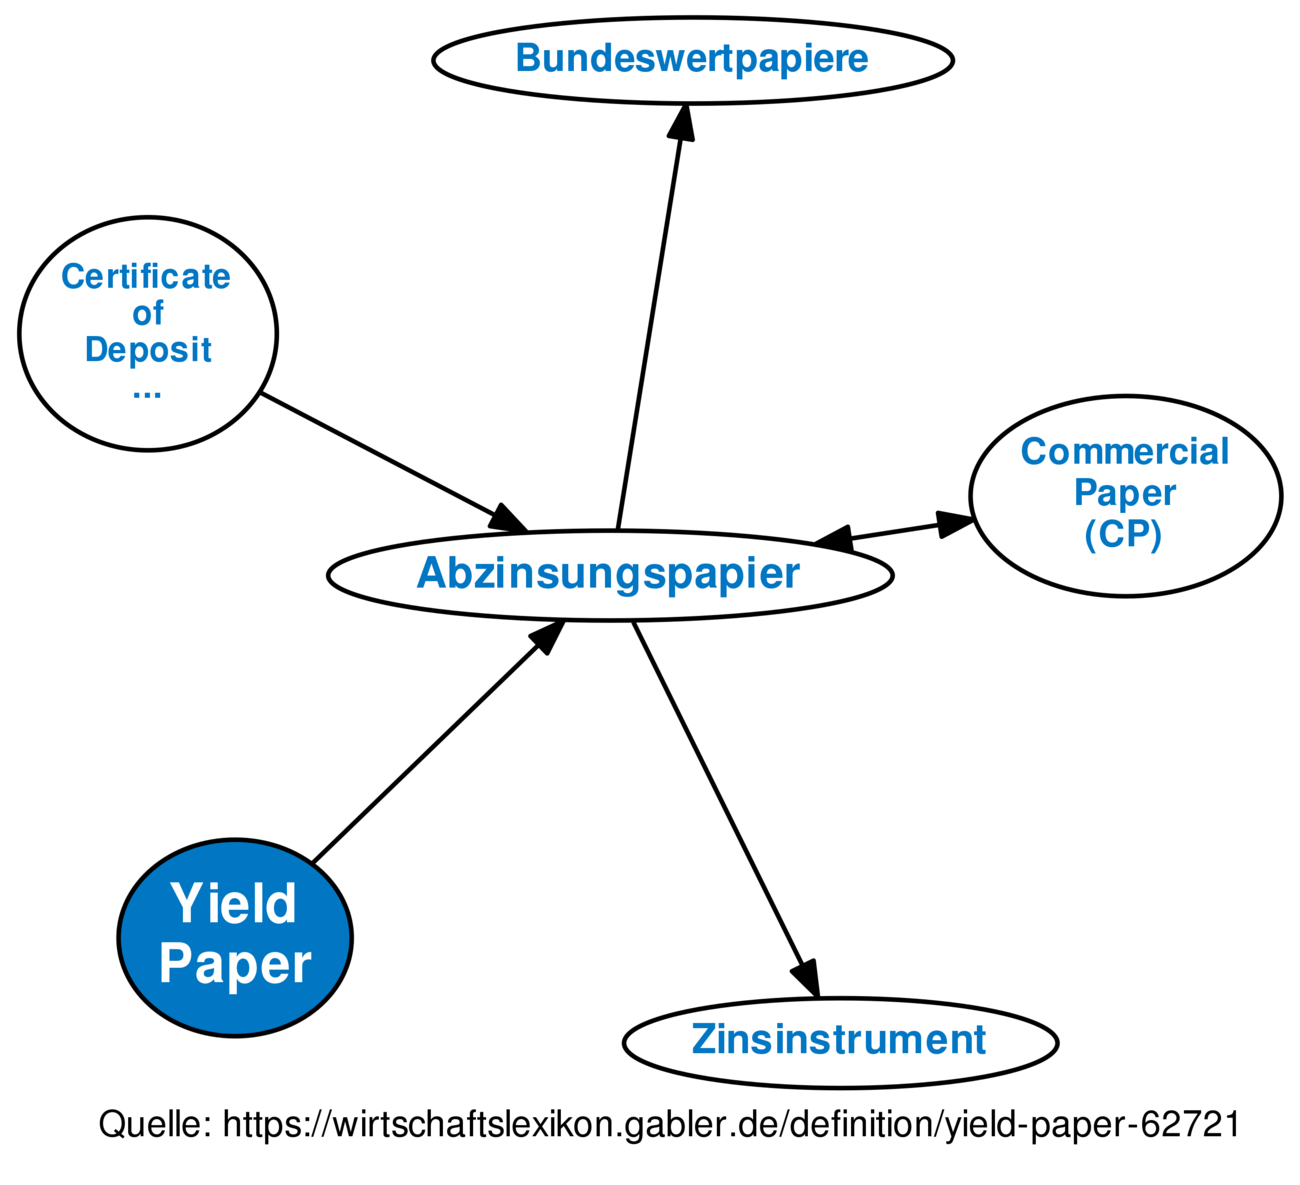 Yield Paper Definition Gabler Banklexikon